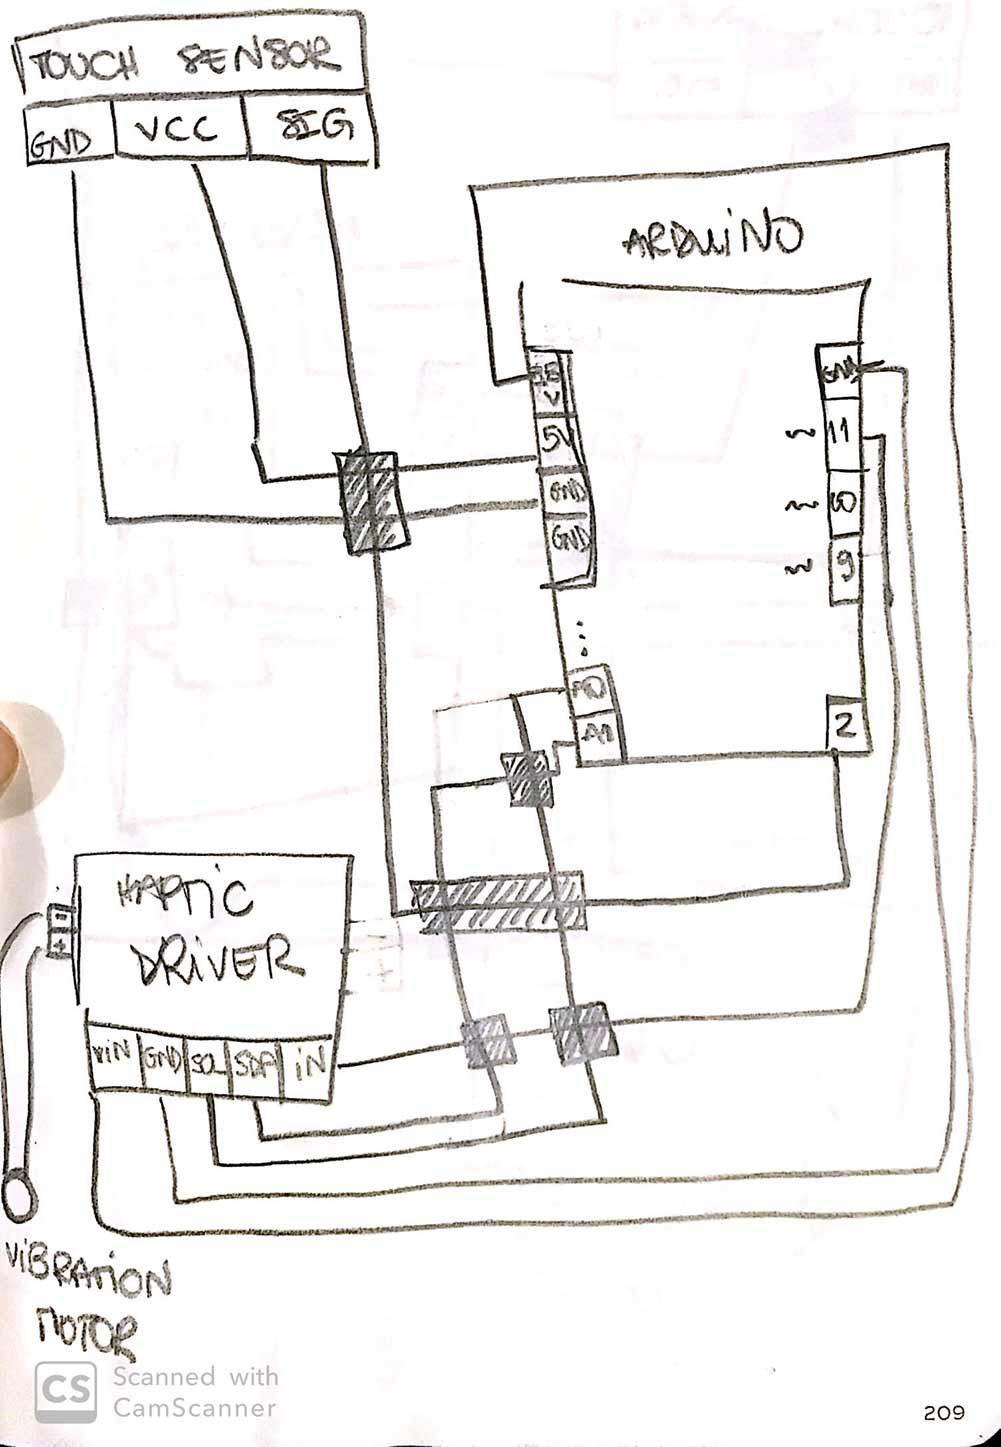 vib motor wiring